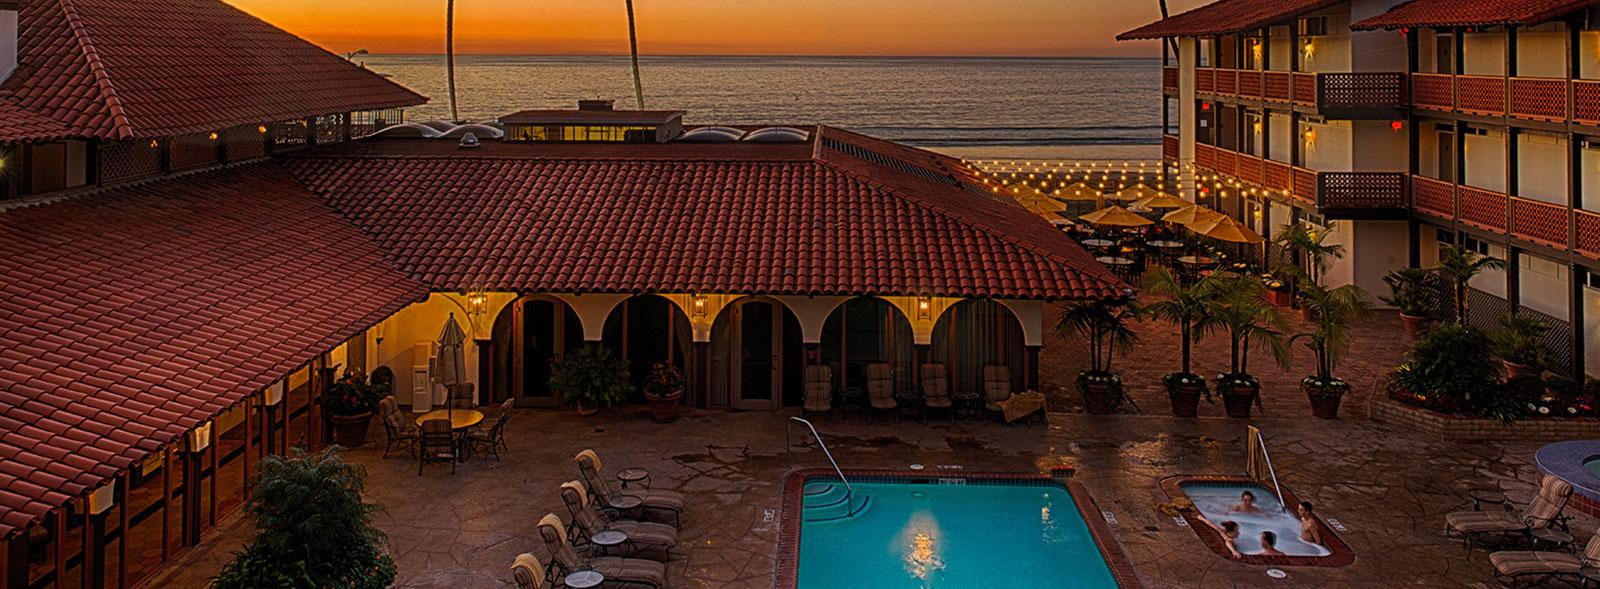 AAA Members La Jolla Shores Hotel